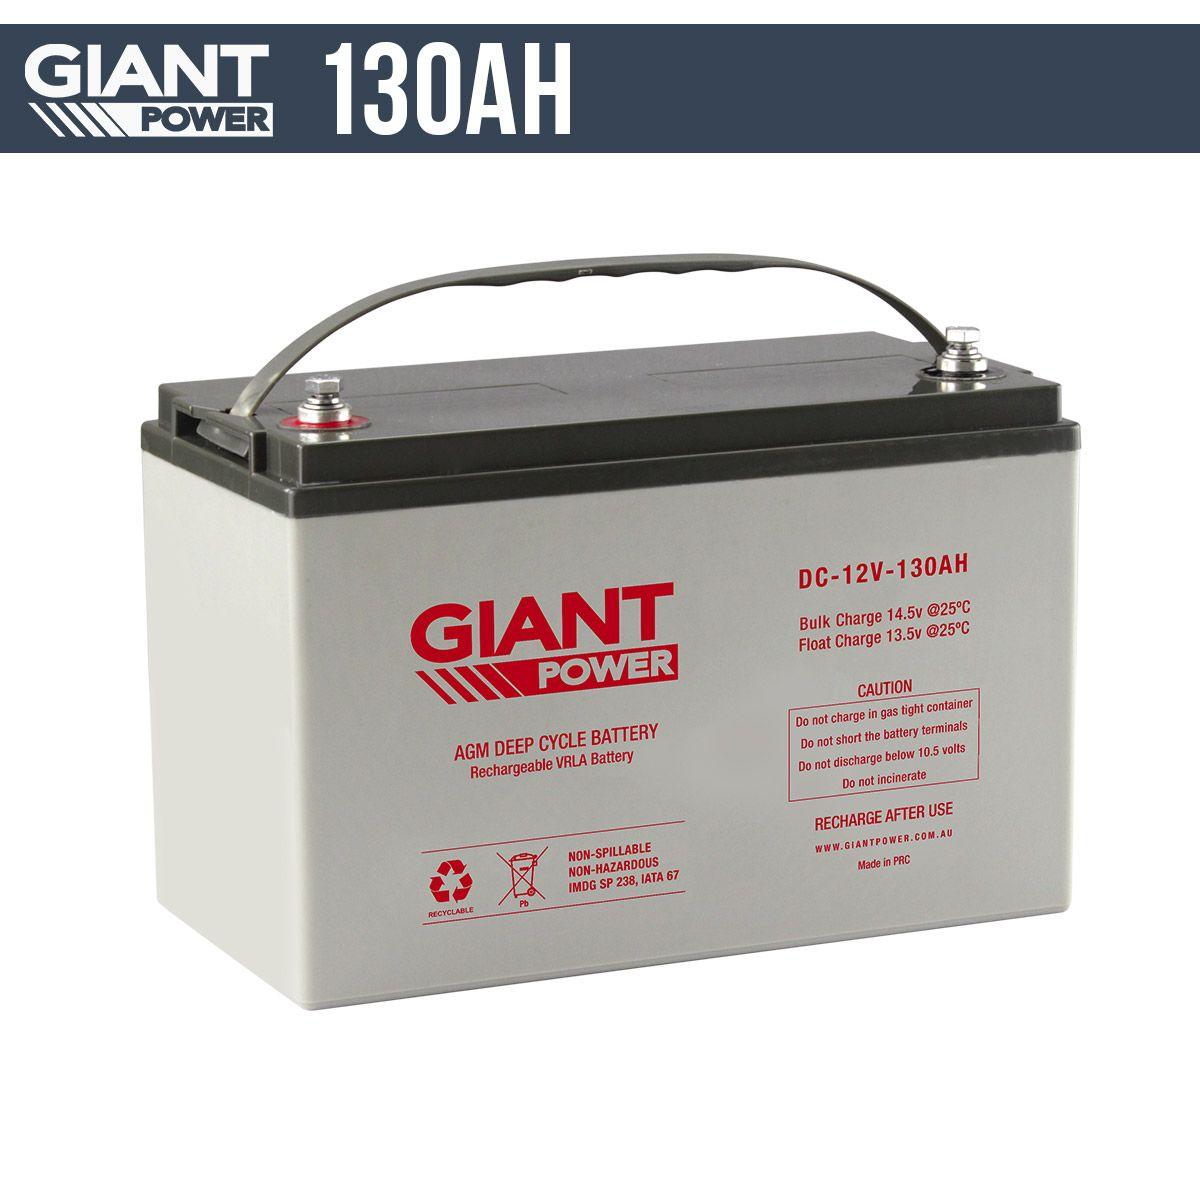 130AH 12V AGM Deep Cycle Battery Discount camping gear